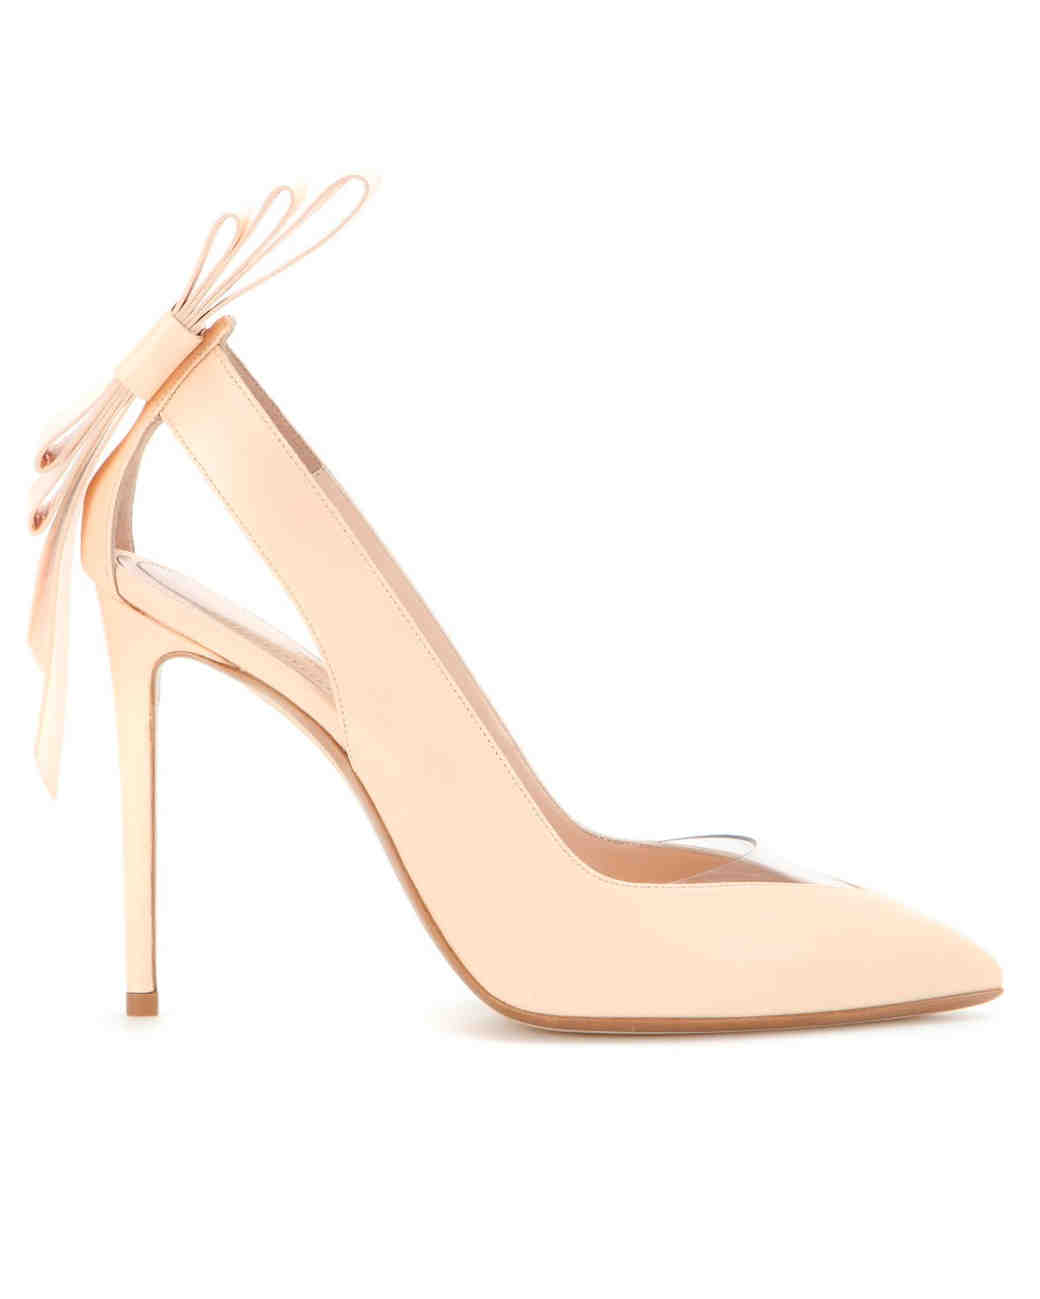 summer-wedding-shoes-nicholas-kirkwood-bow-pumps-0515.jpg